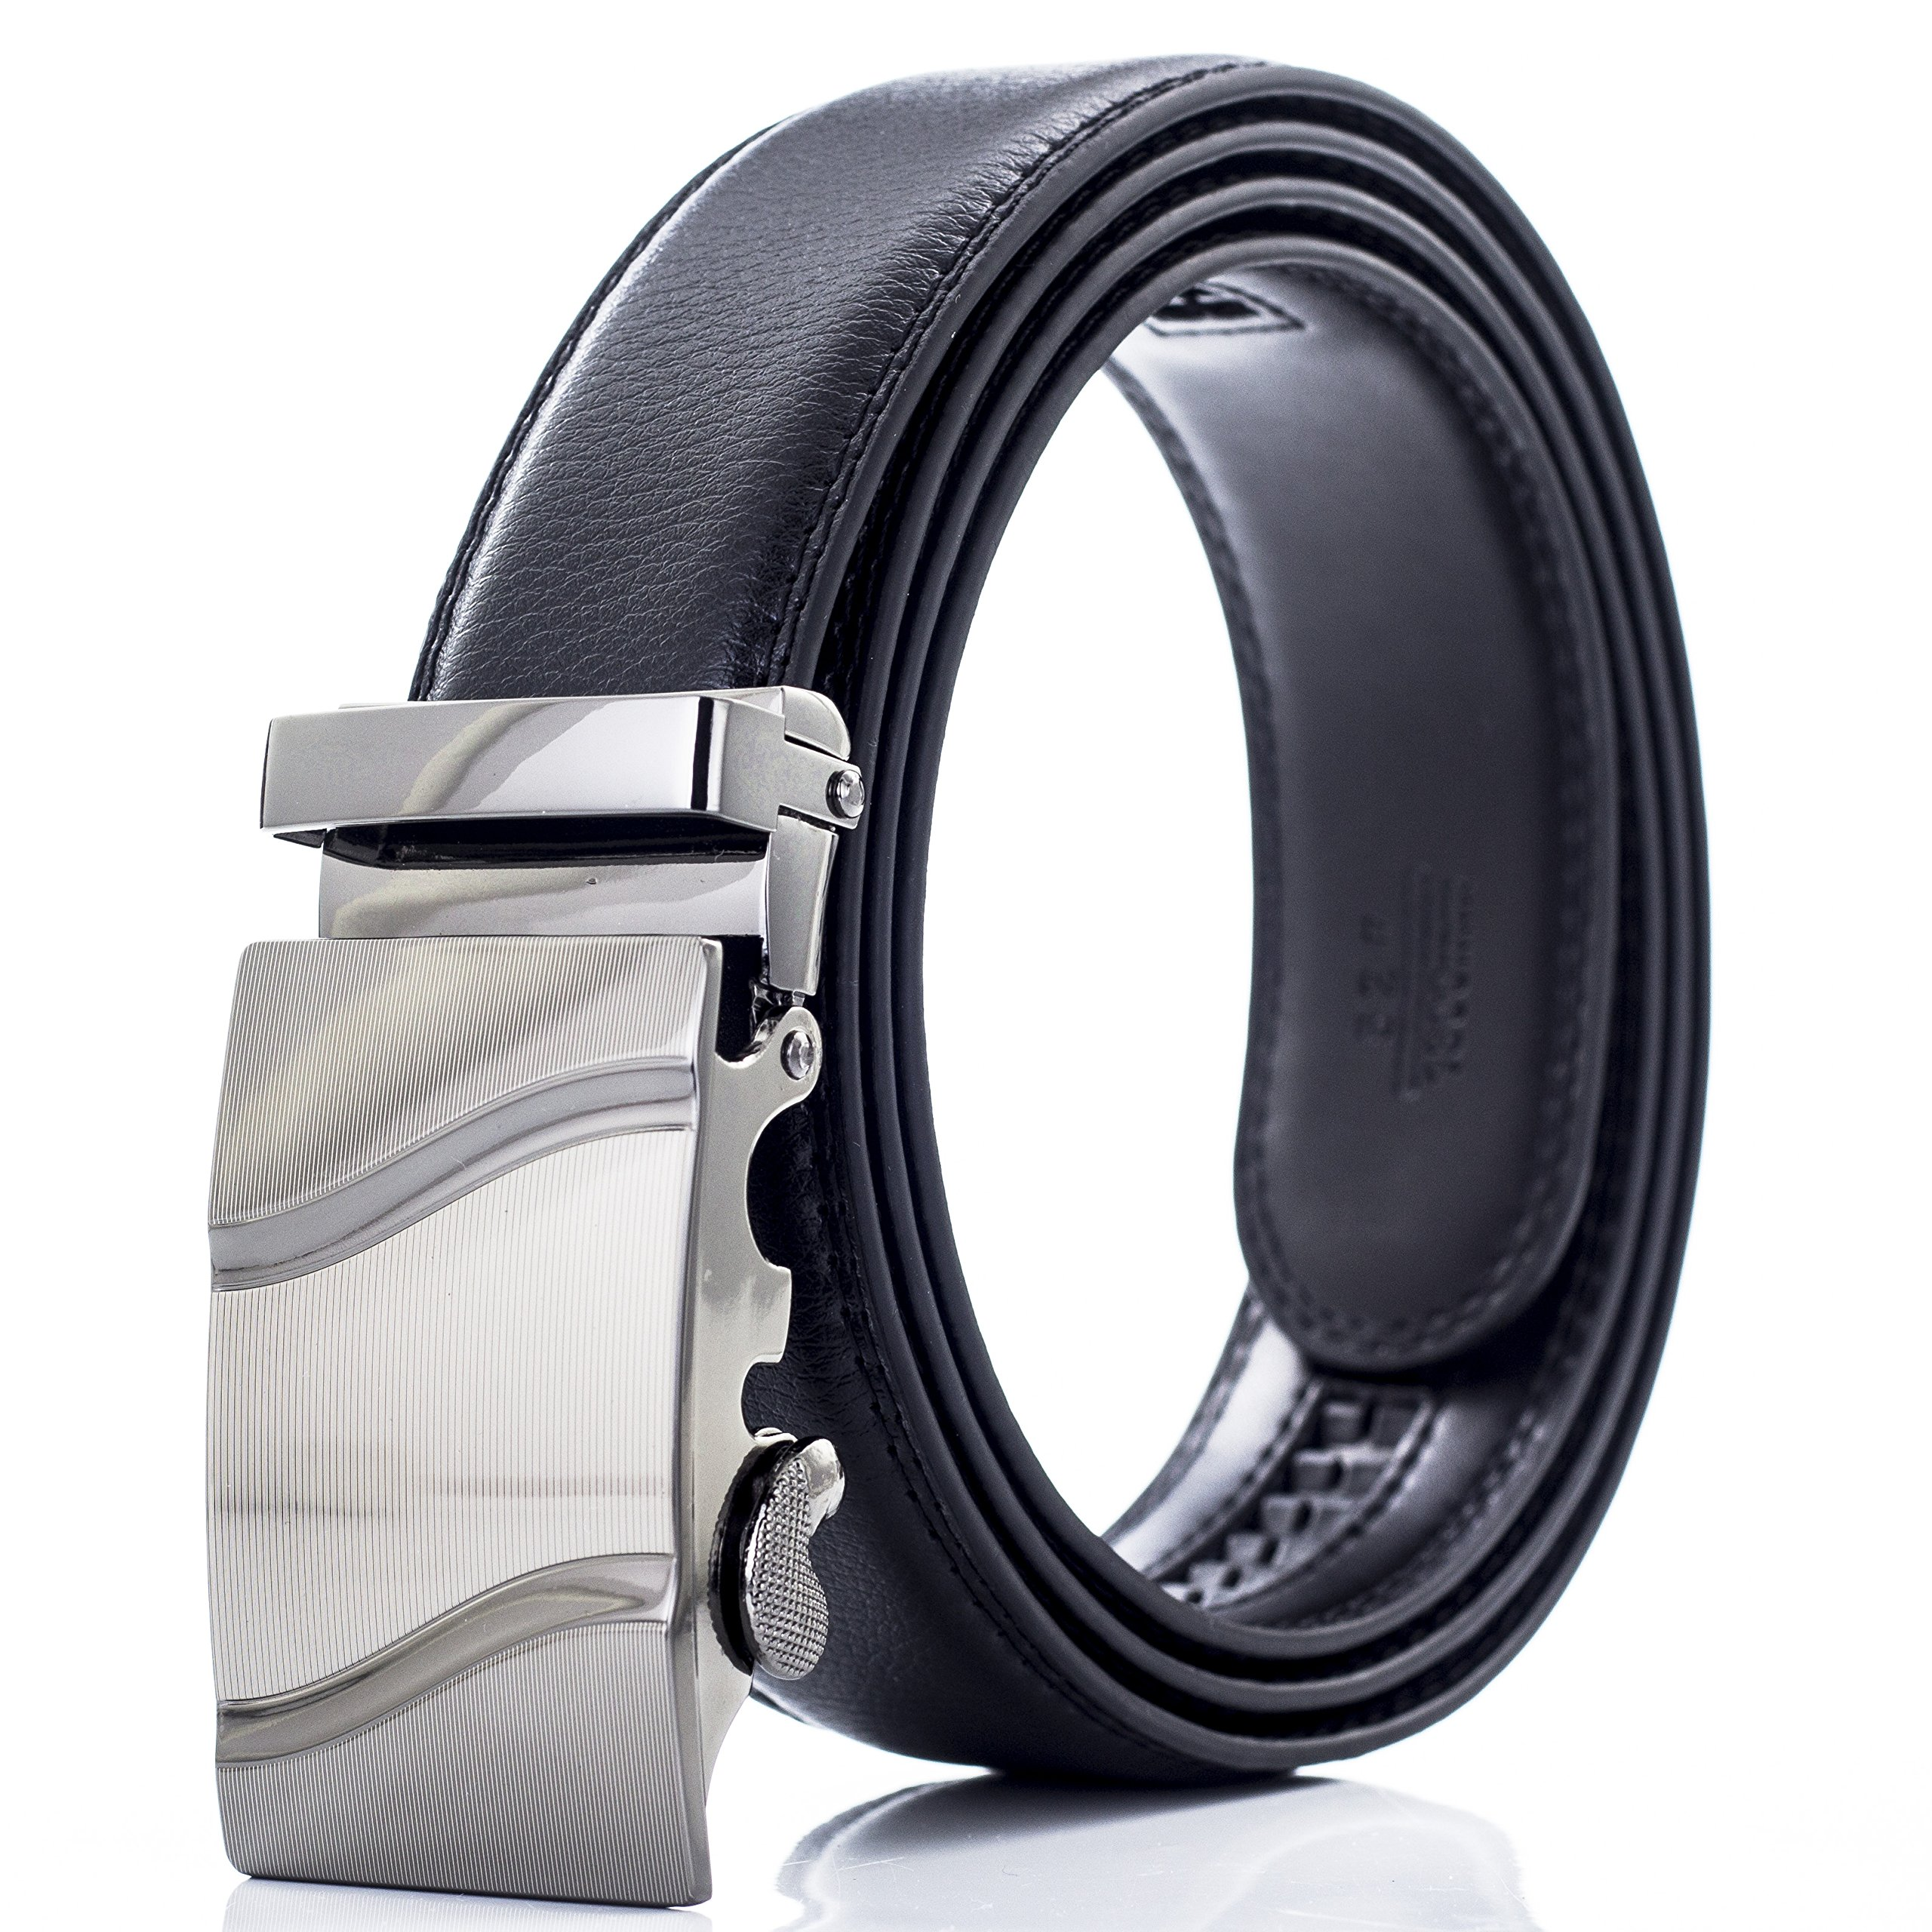 Automatic Ratchet Leather Belt For Men, Durable Alloy Metal Buckle, 35mm Wide DA02-BLK